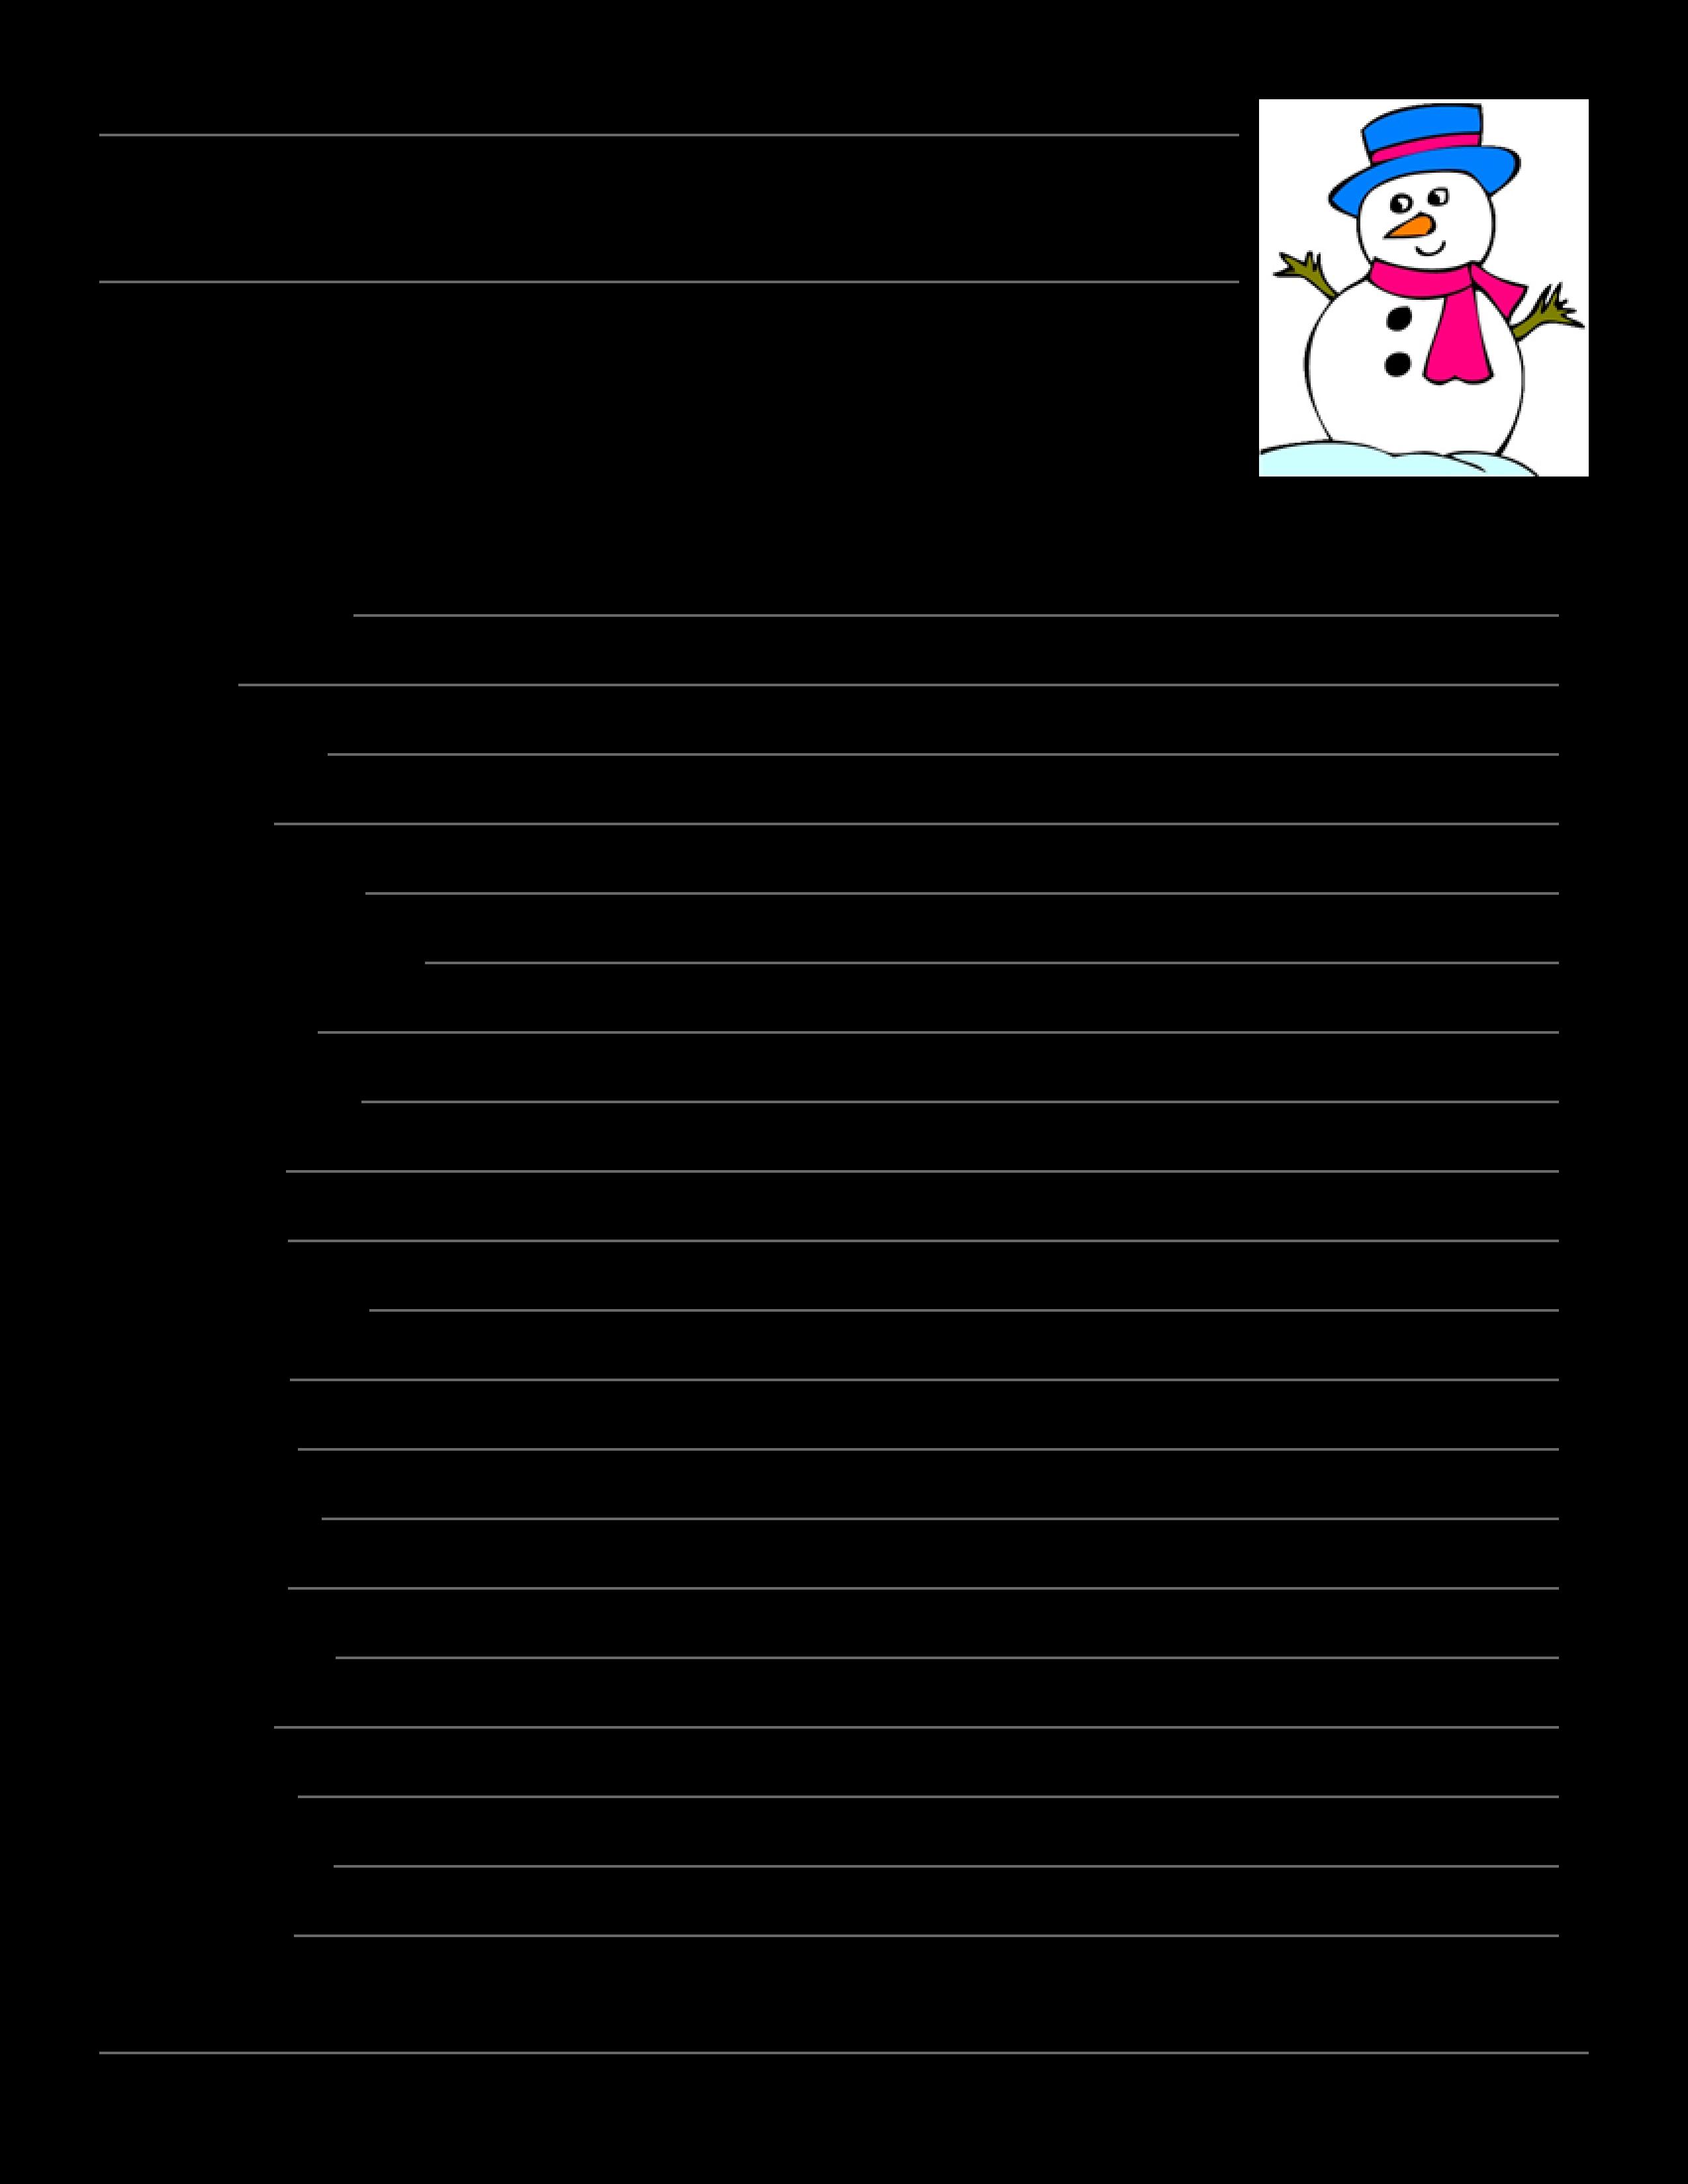 free winter word scramble templates at